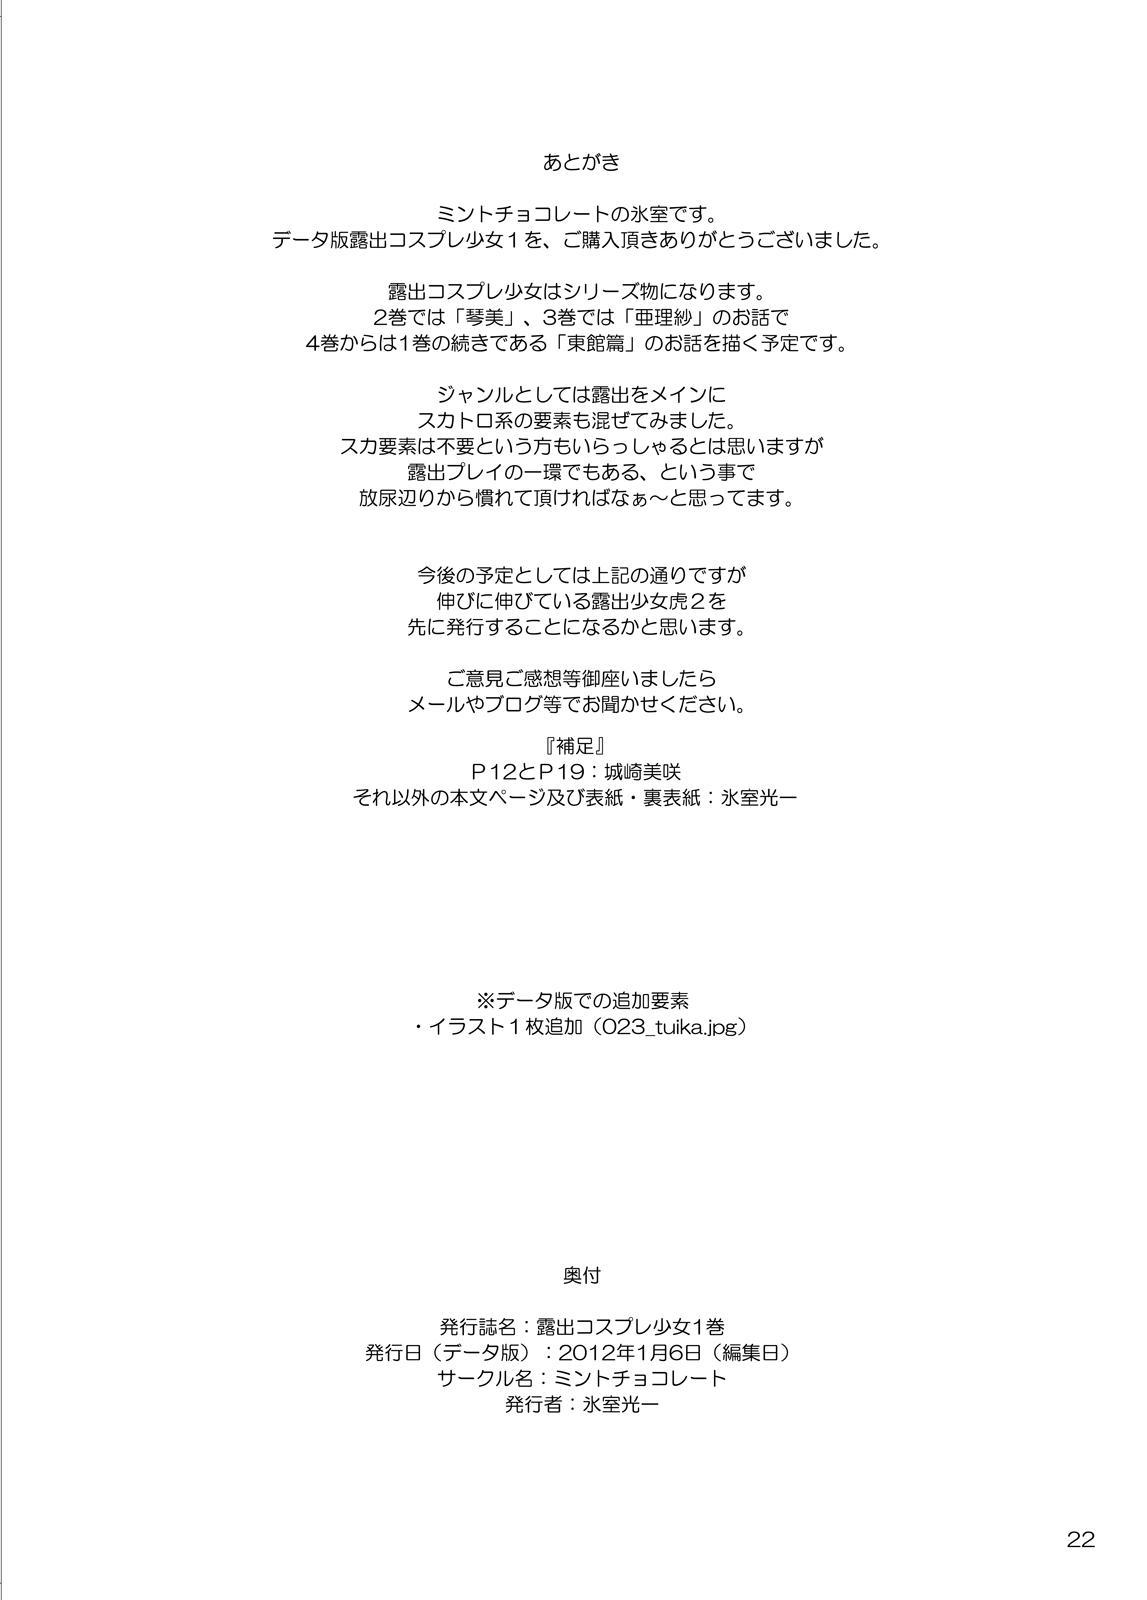 Roshutsu Cosplay Shoujo 1-kan 20